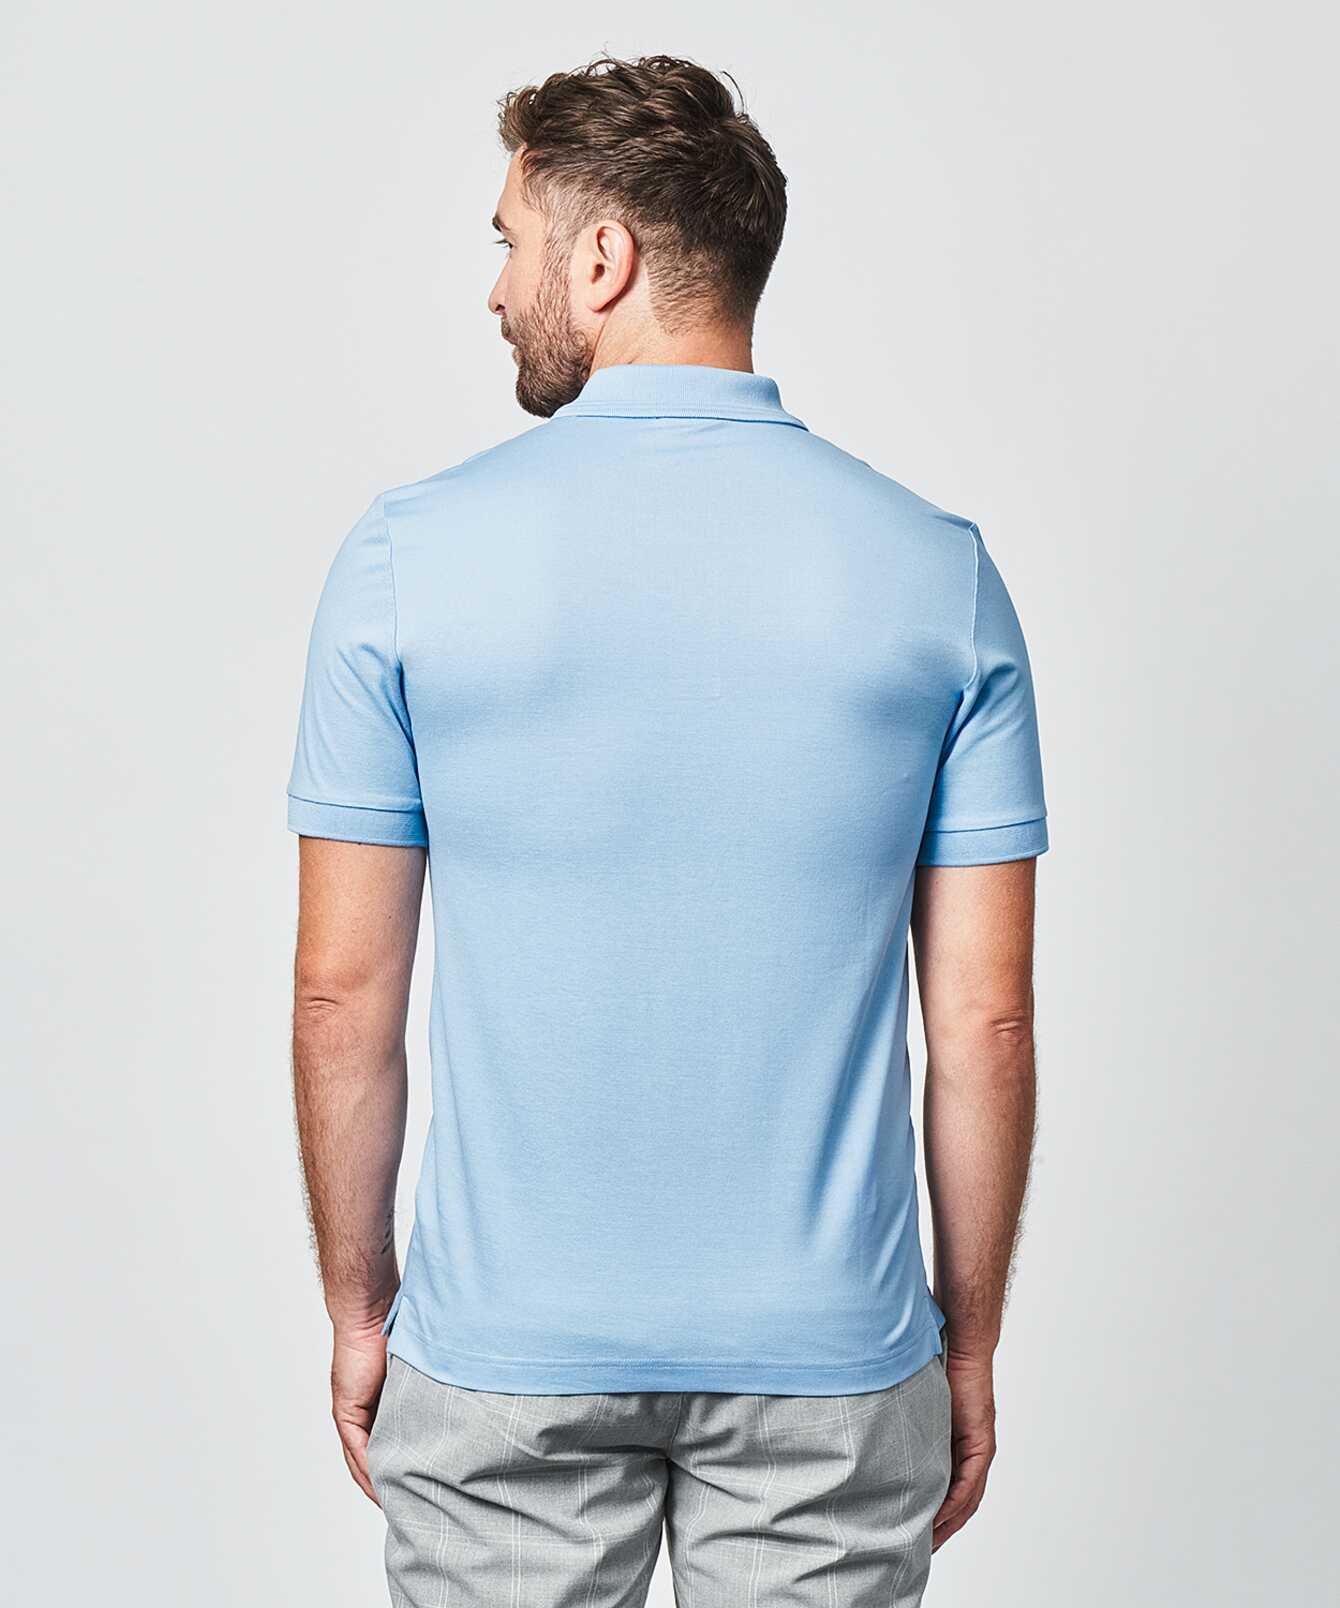 Shirt Mercerized polo shirt light blue The Shirt Factory